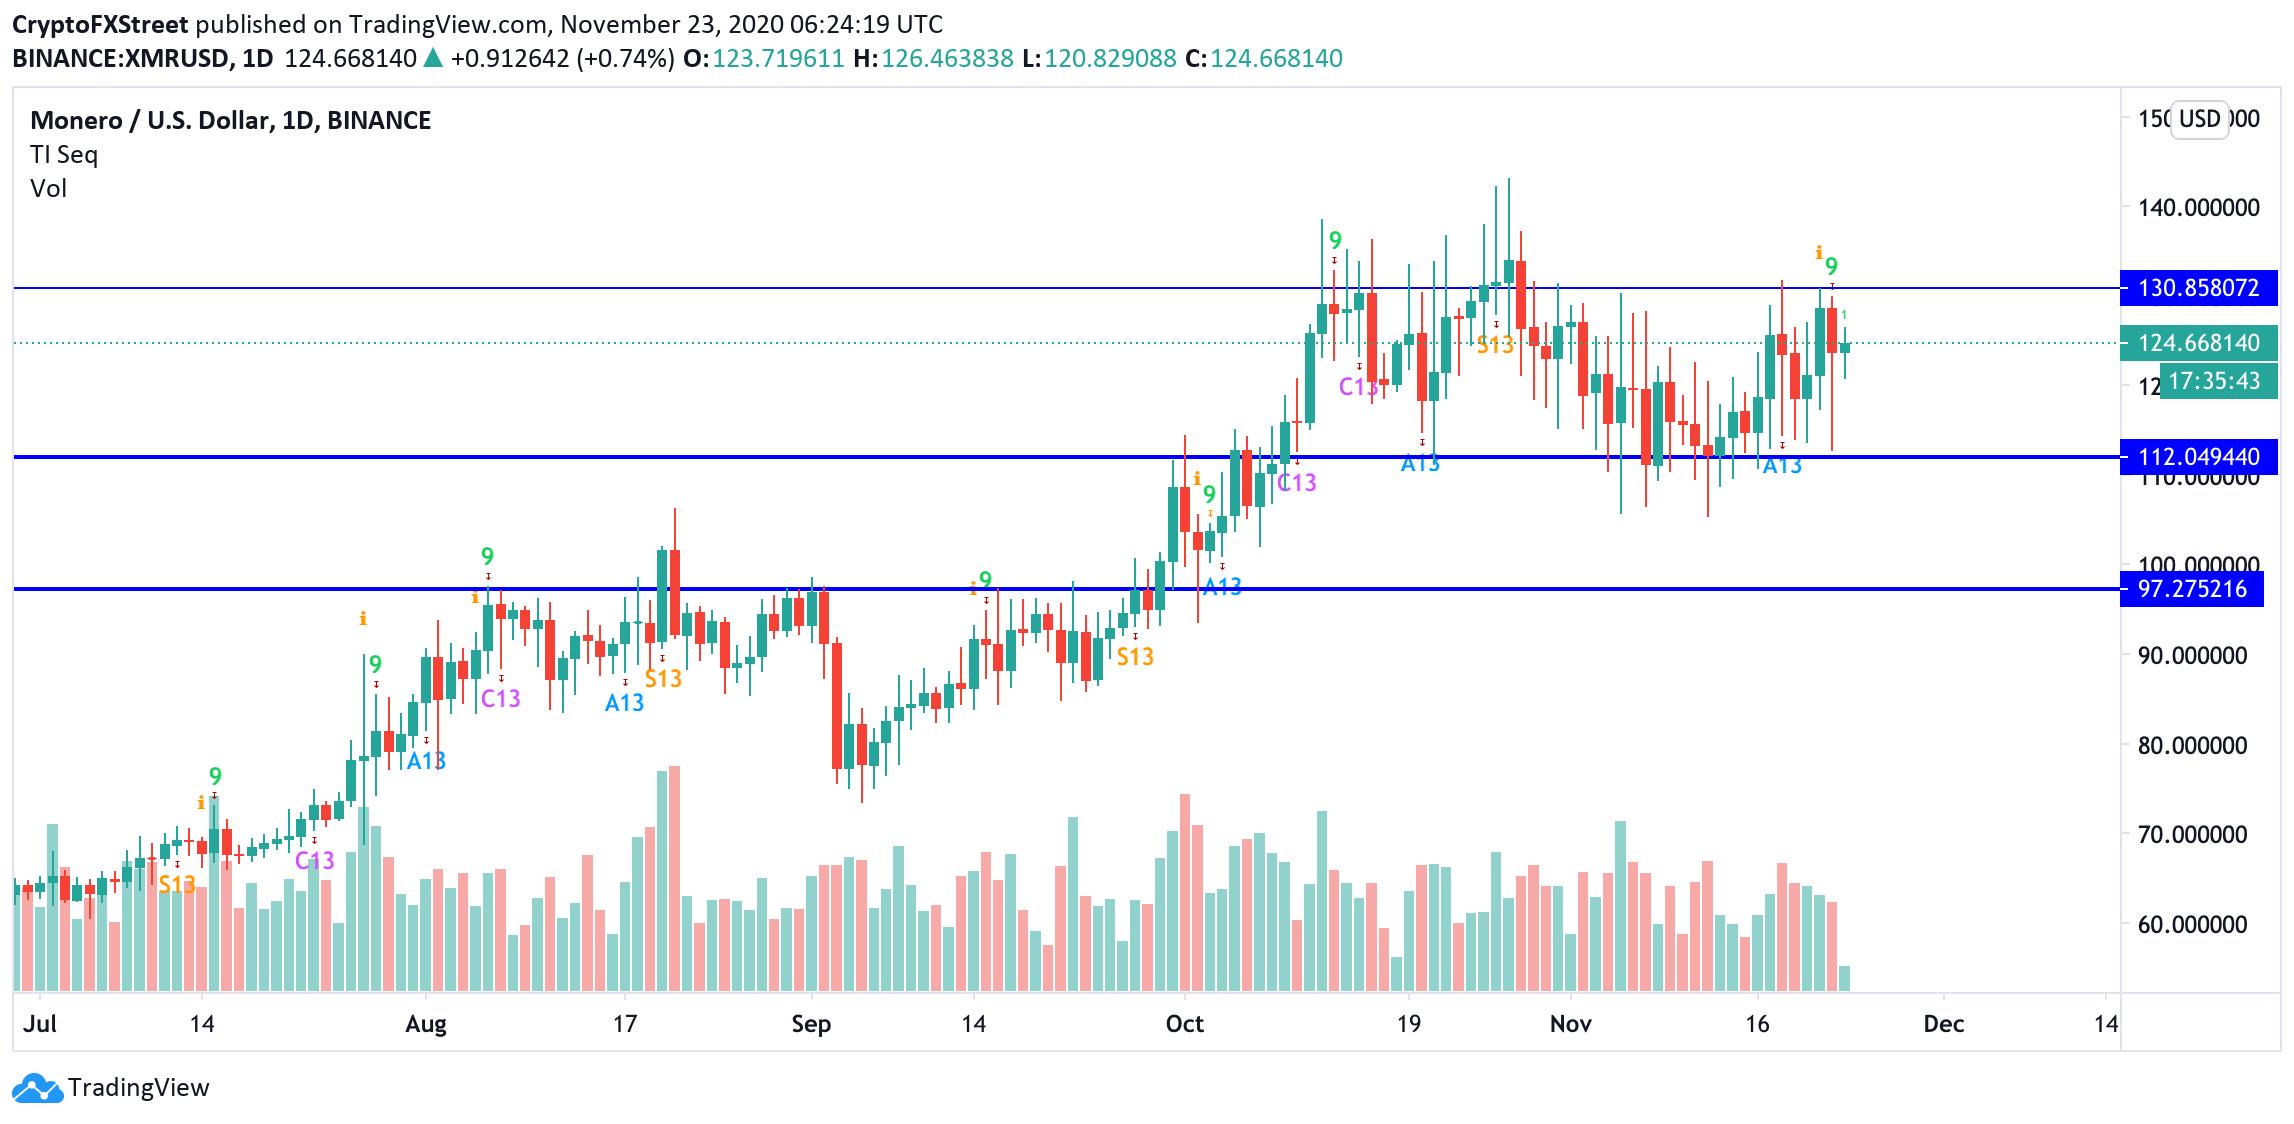 XMR/USD, daily chart